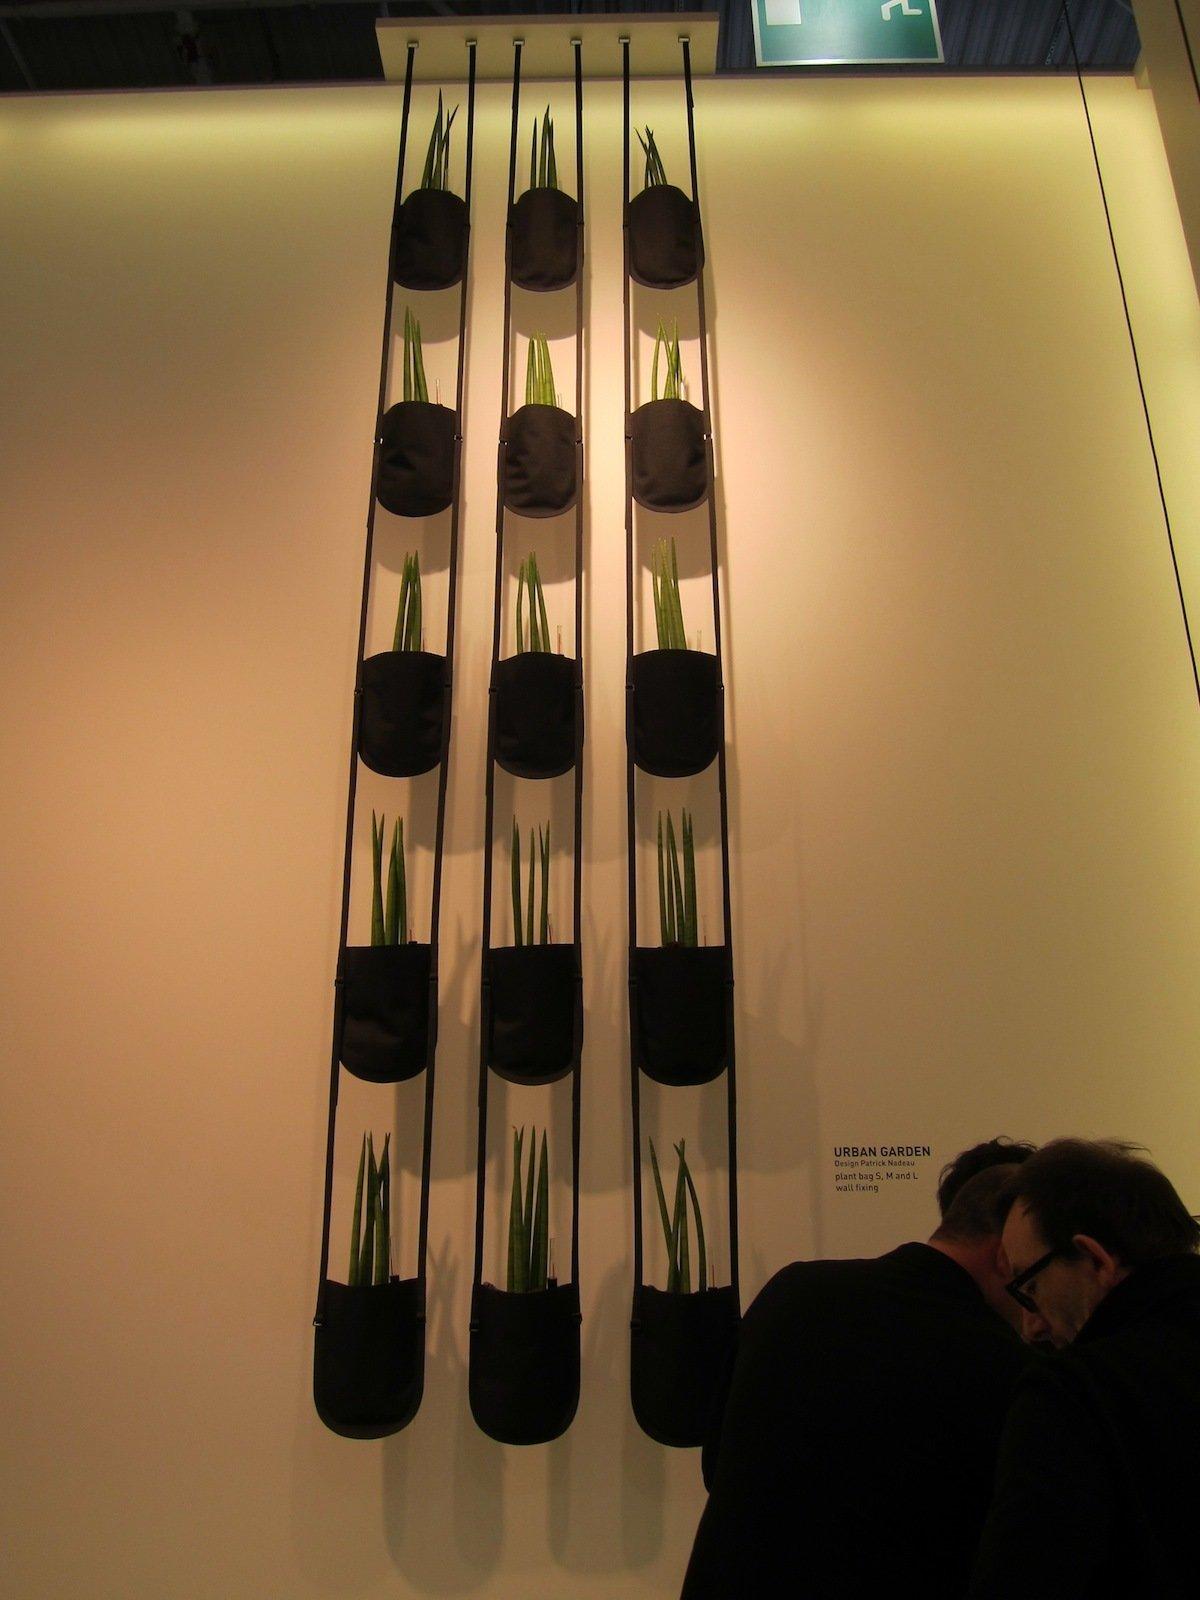 Maison & Objet 2011: Part One by Jaime Gillin